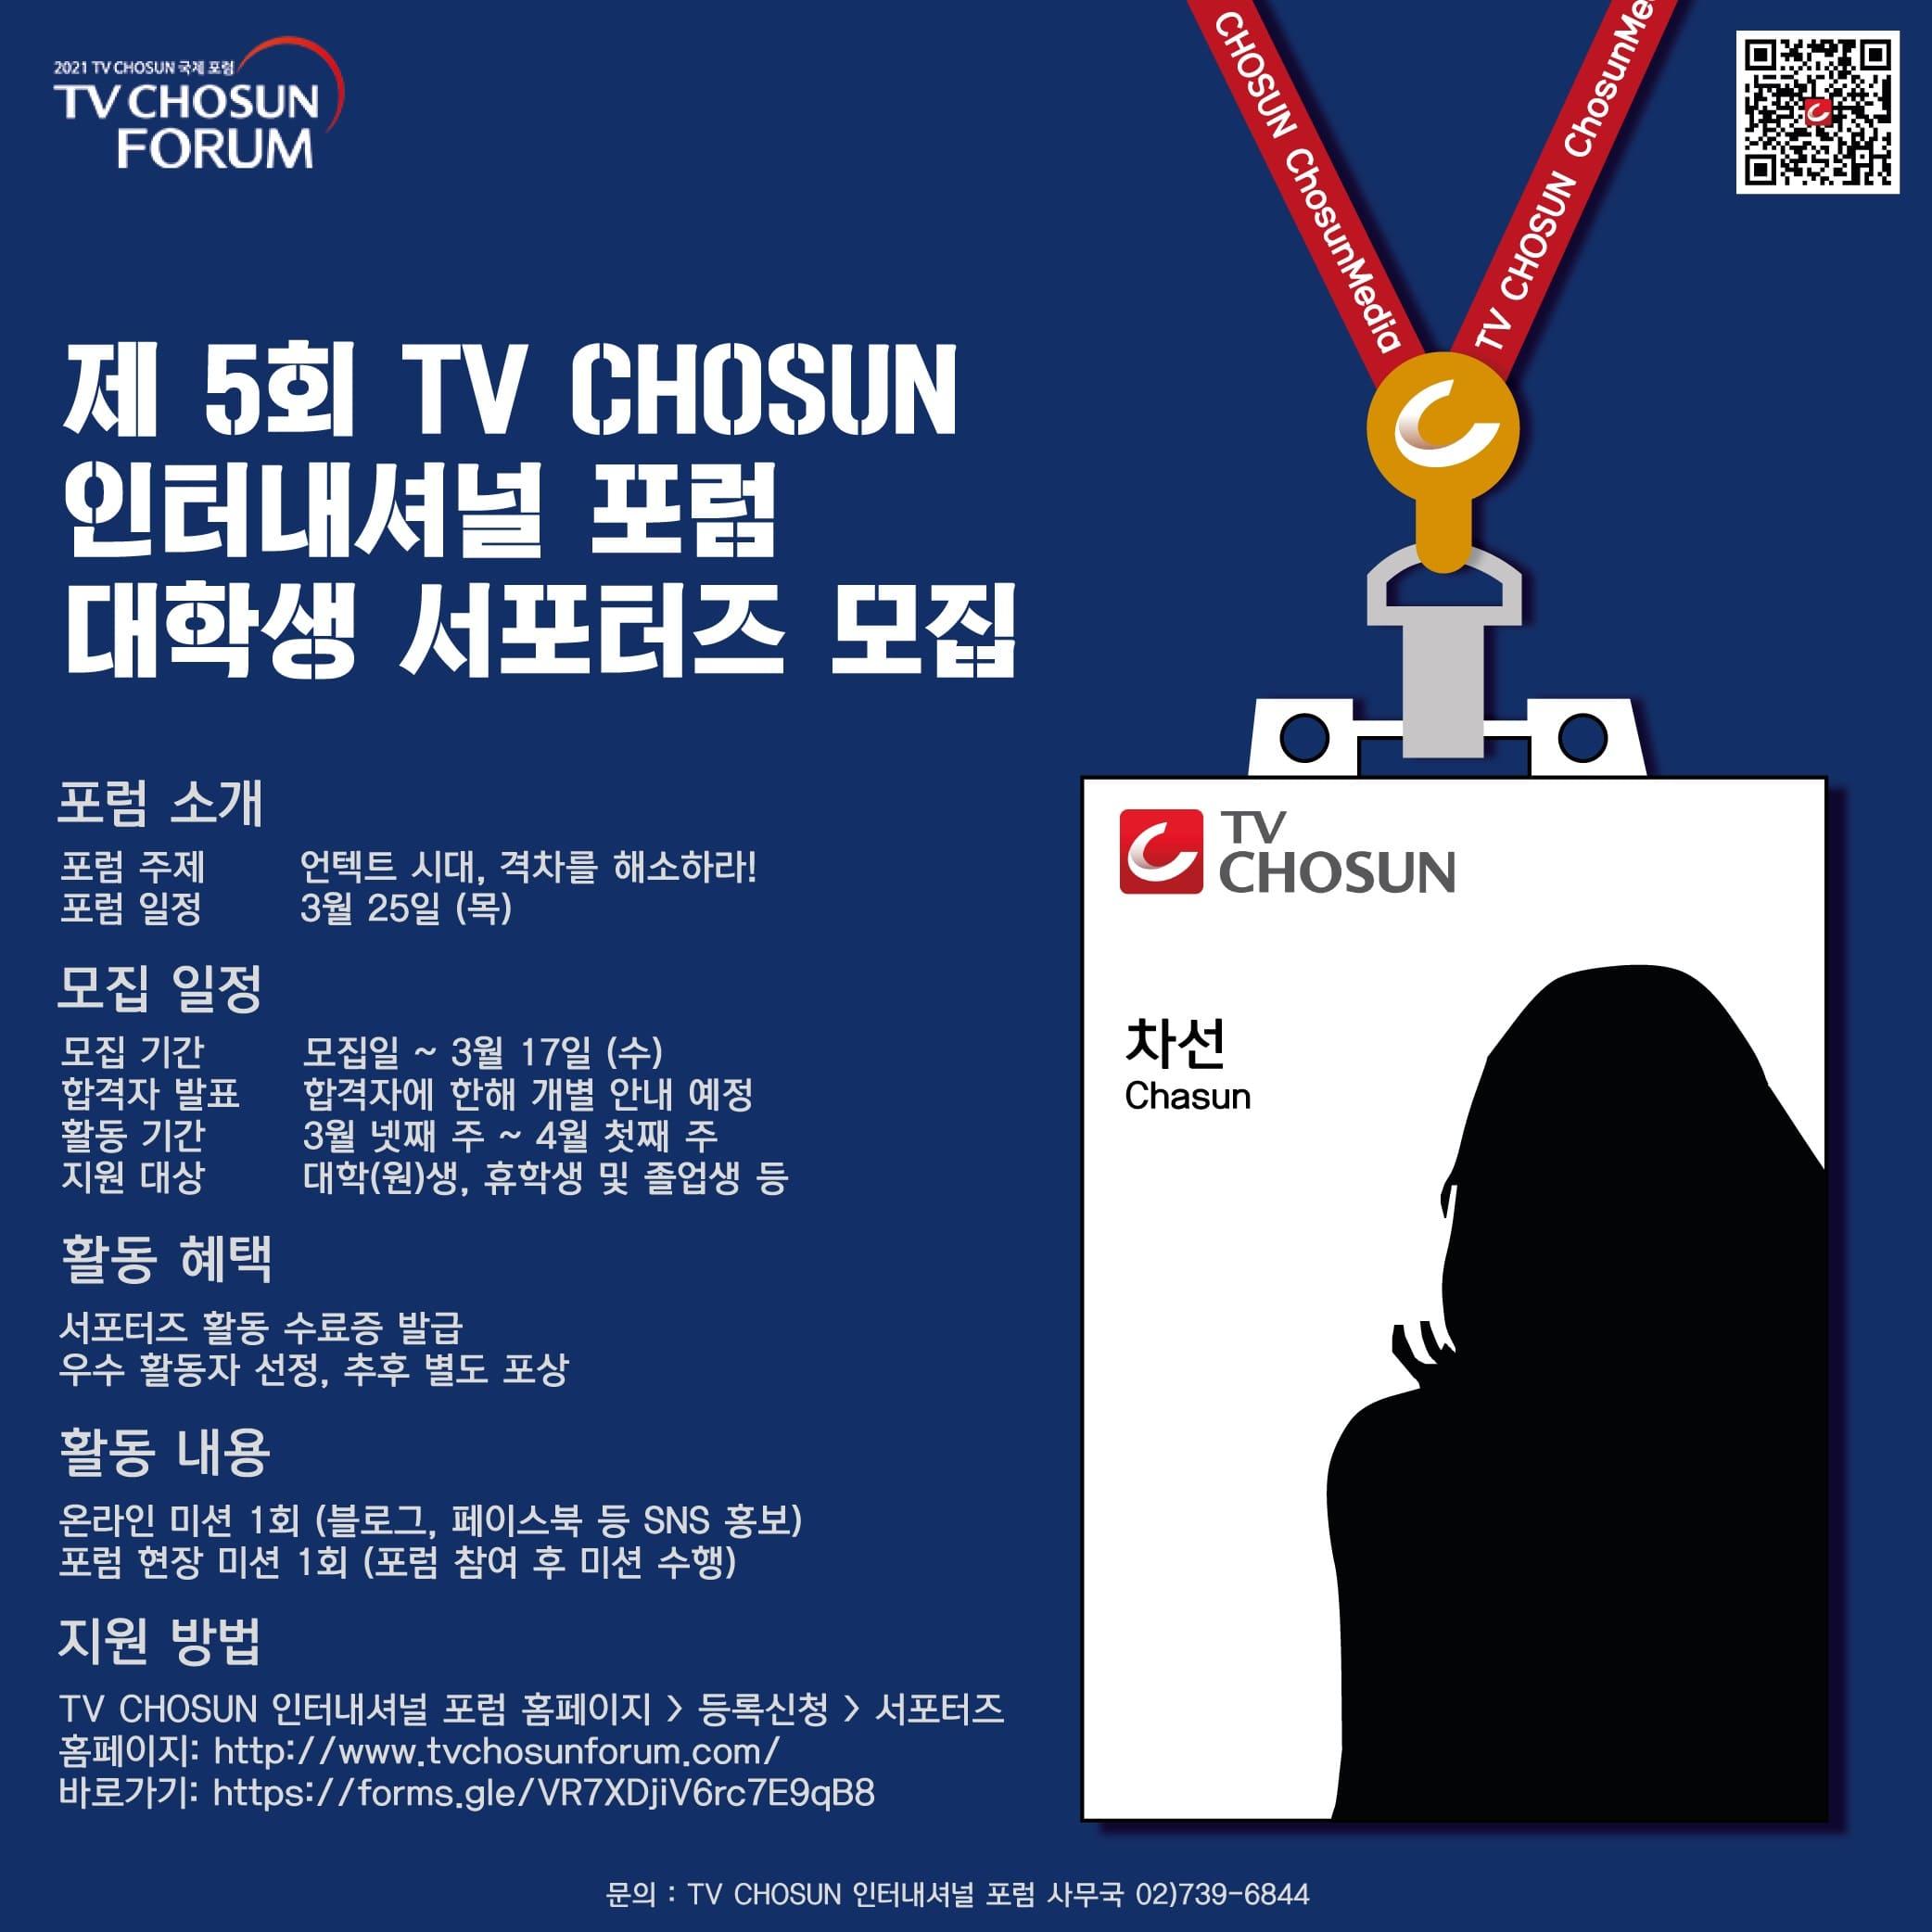 2021 TV CHOSUN 인터내셔널 포럼 서포터즈 모집